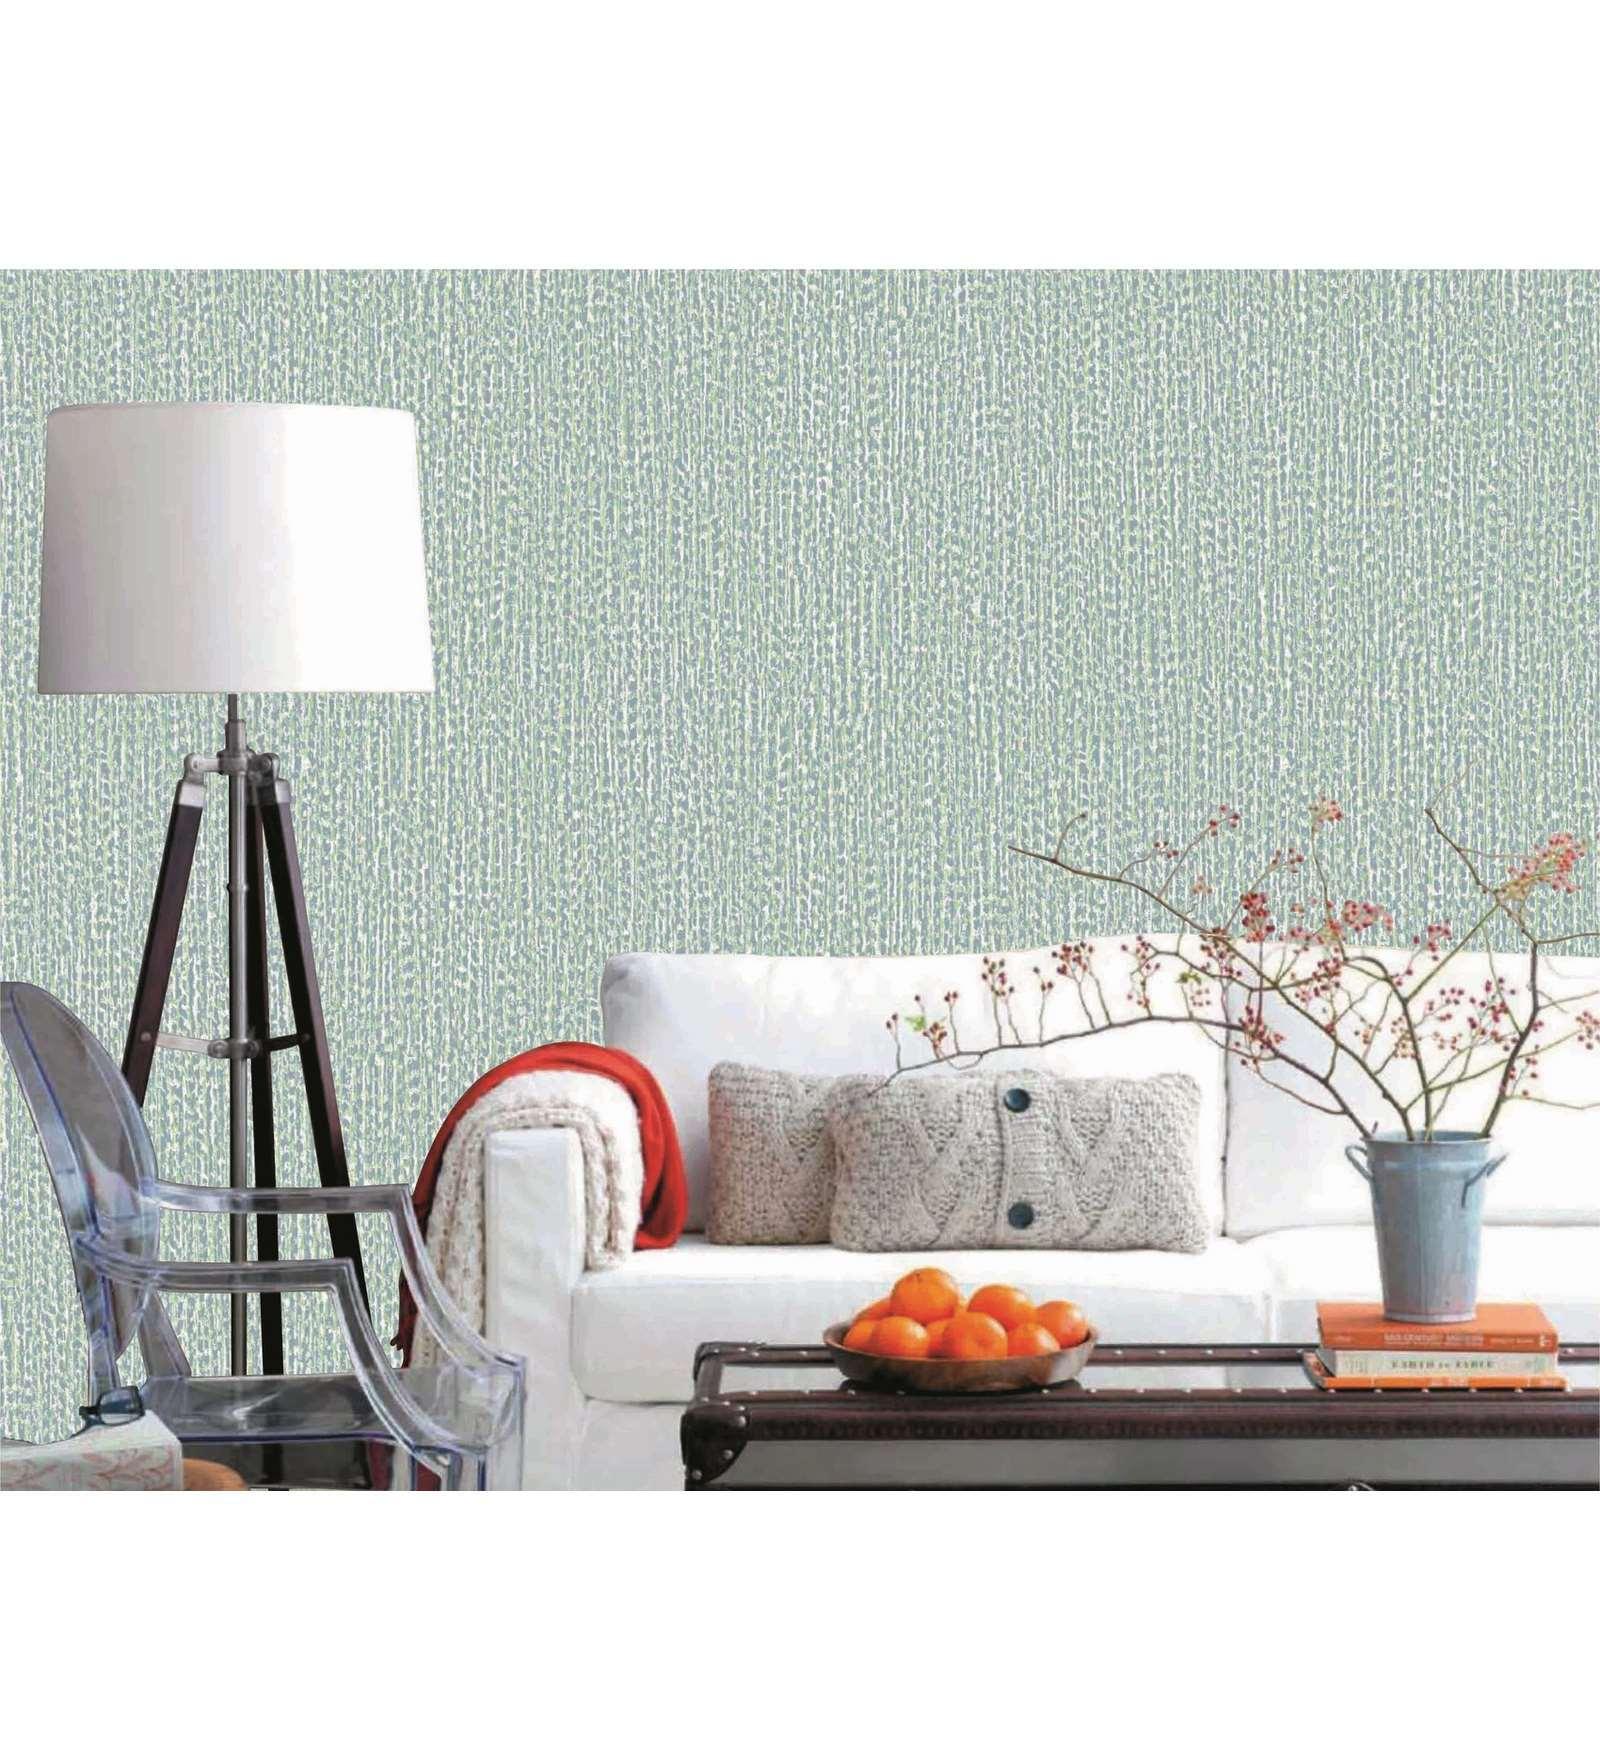 Sky Blue PVC 394 x 21 Inch Wallpaper by Presto